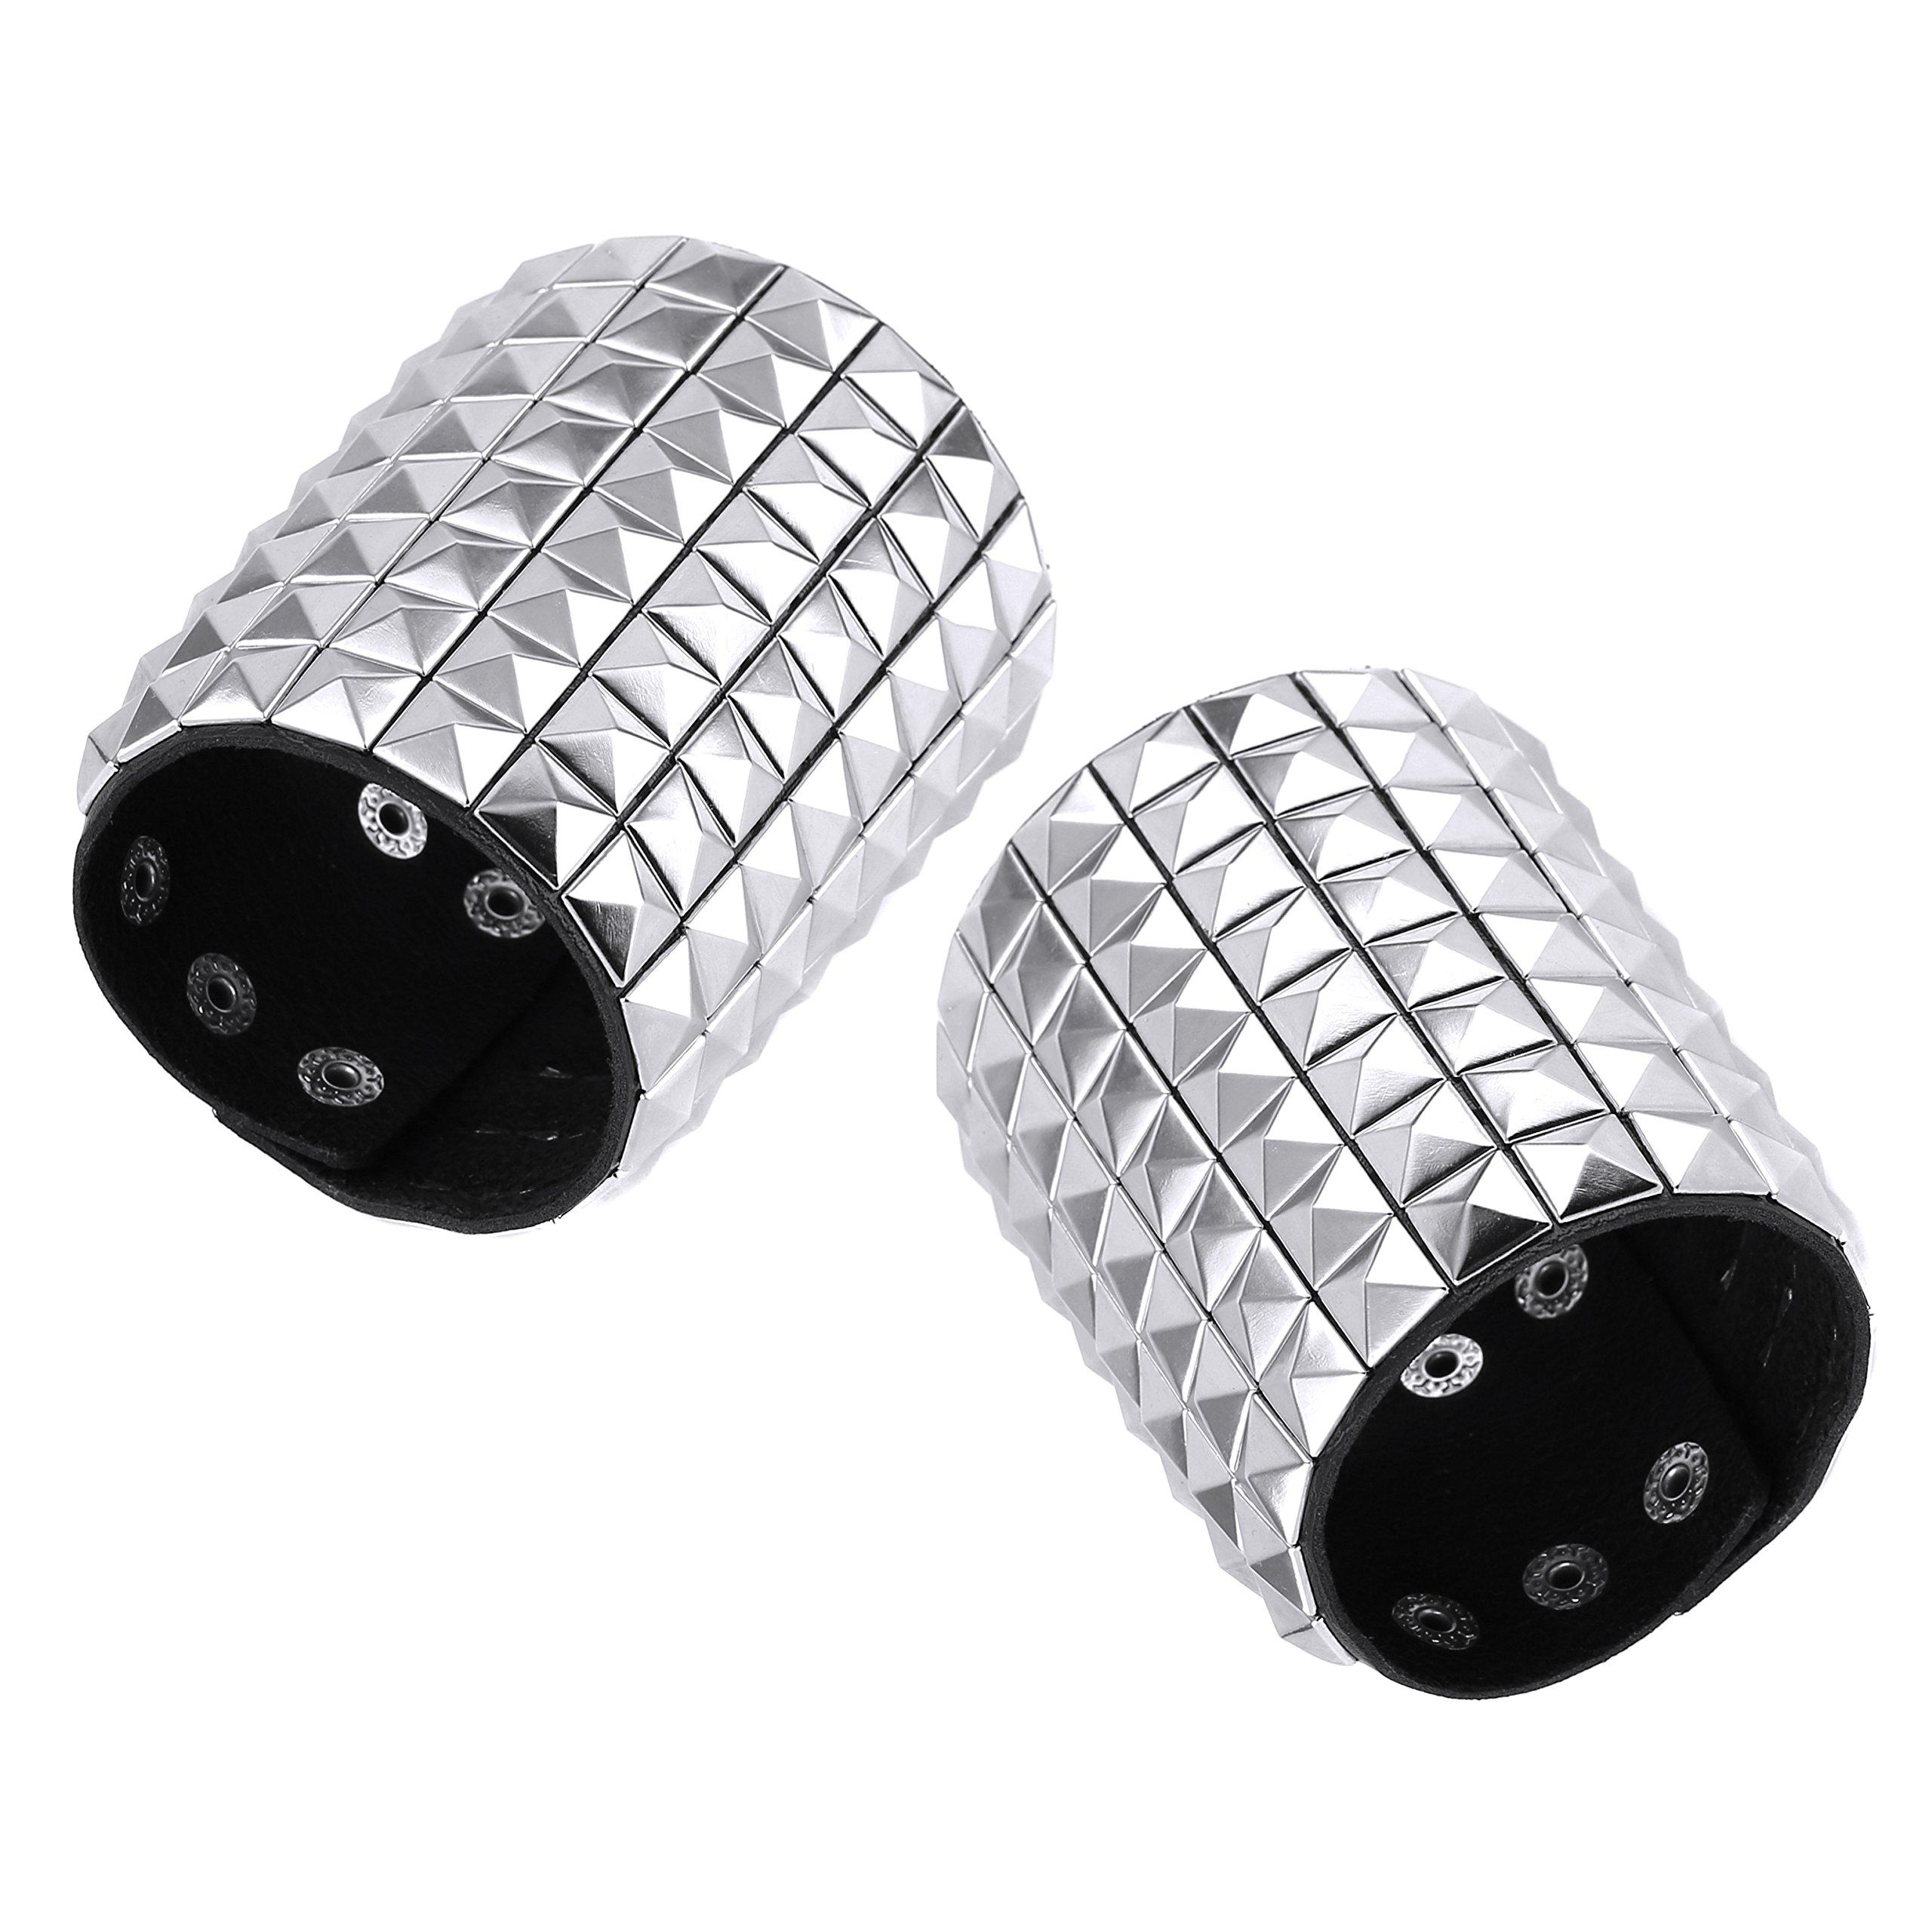 HZMAN Silver Studded Leather Wide Nickel Pyramid Stud Cuff Wrap Gauntlet Wristband Buckle Fastening Arm Armor Cuff (2 Pcs a Set)